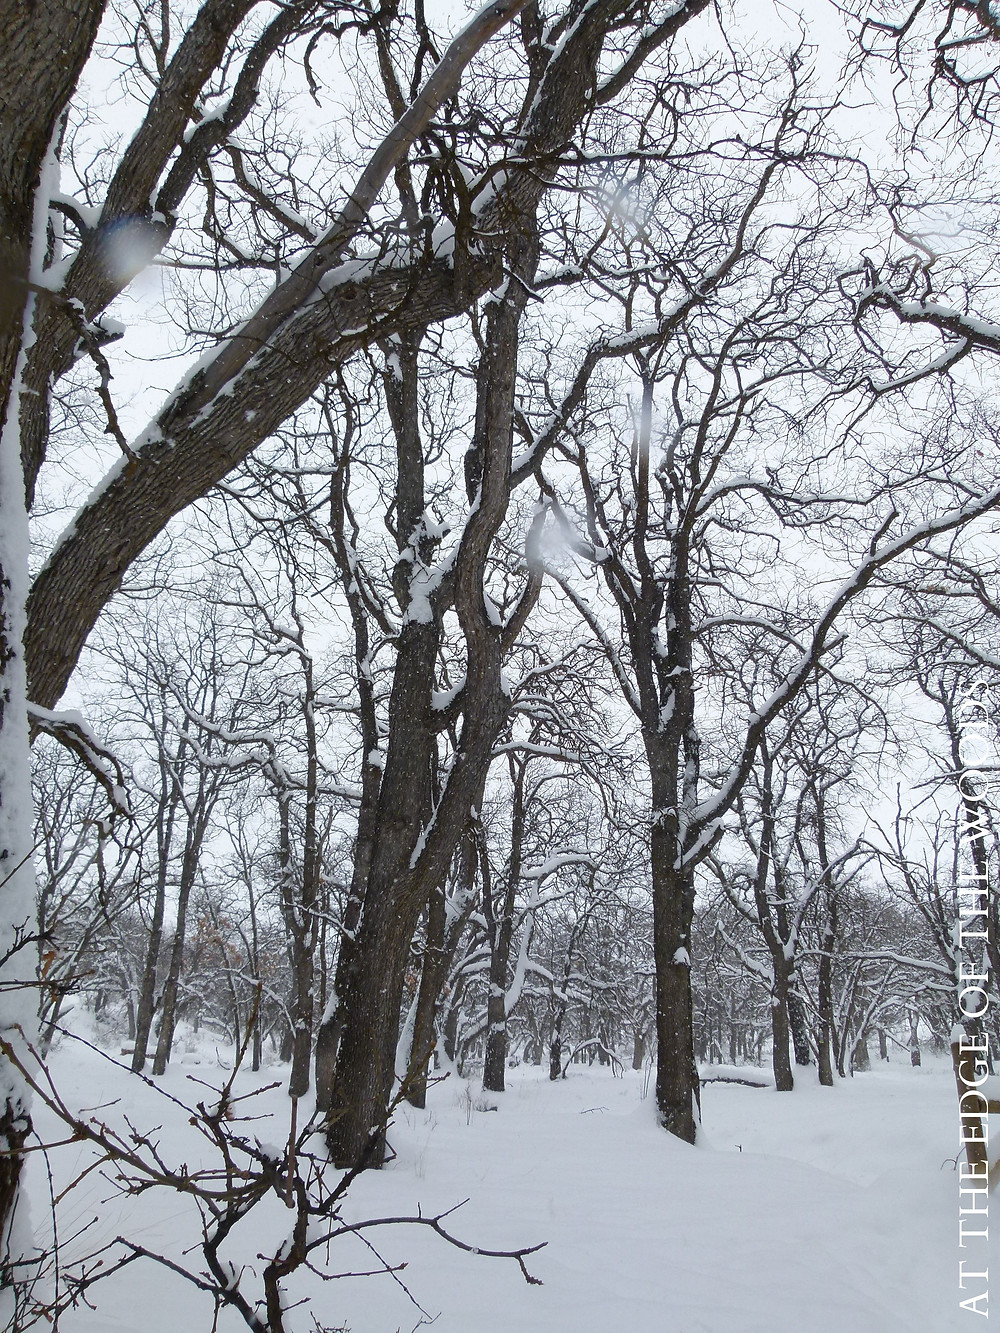 snow falling in the oak forest